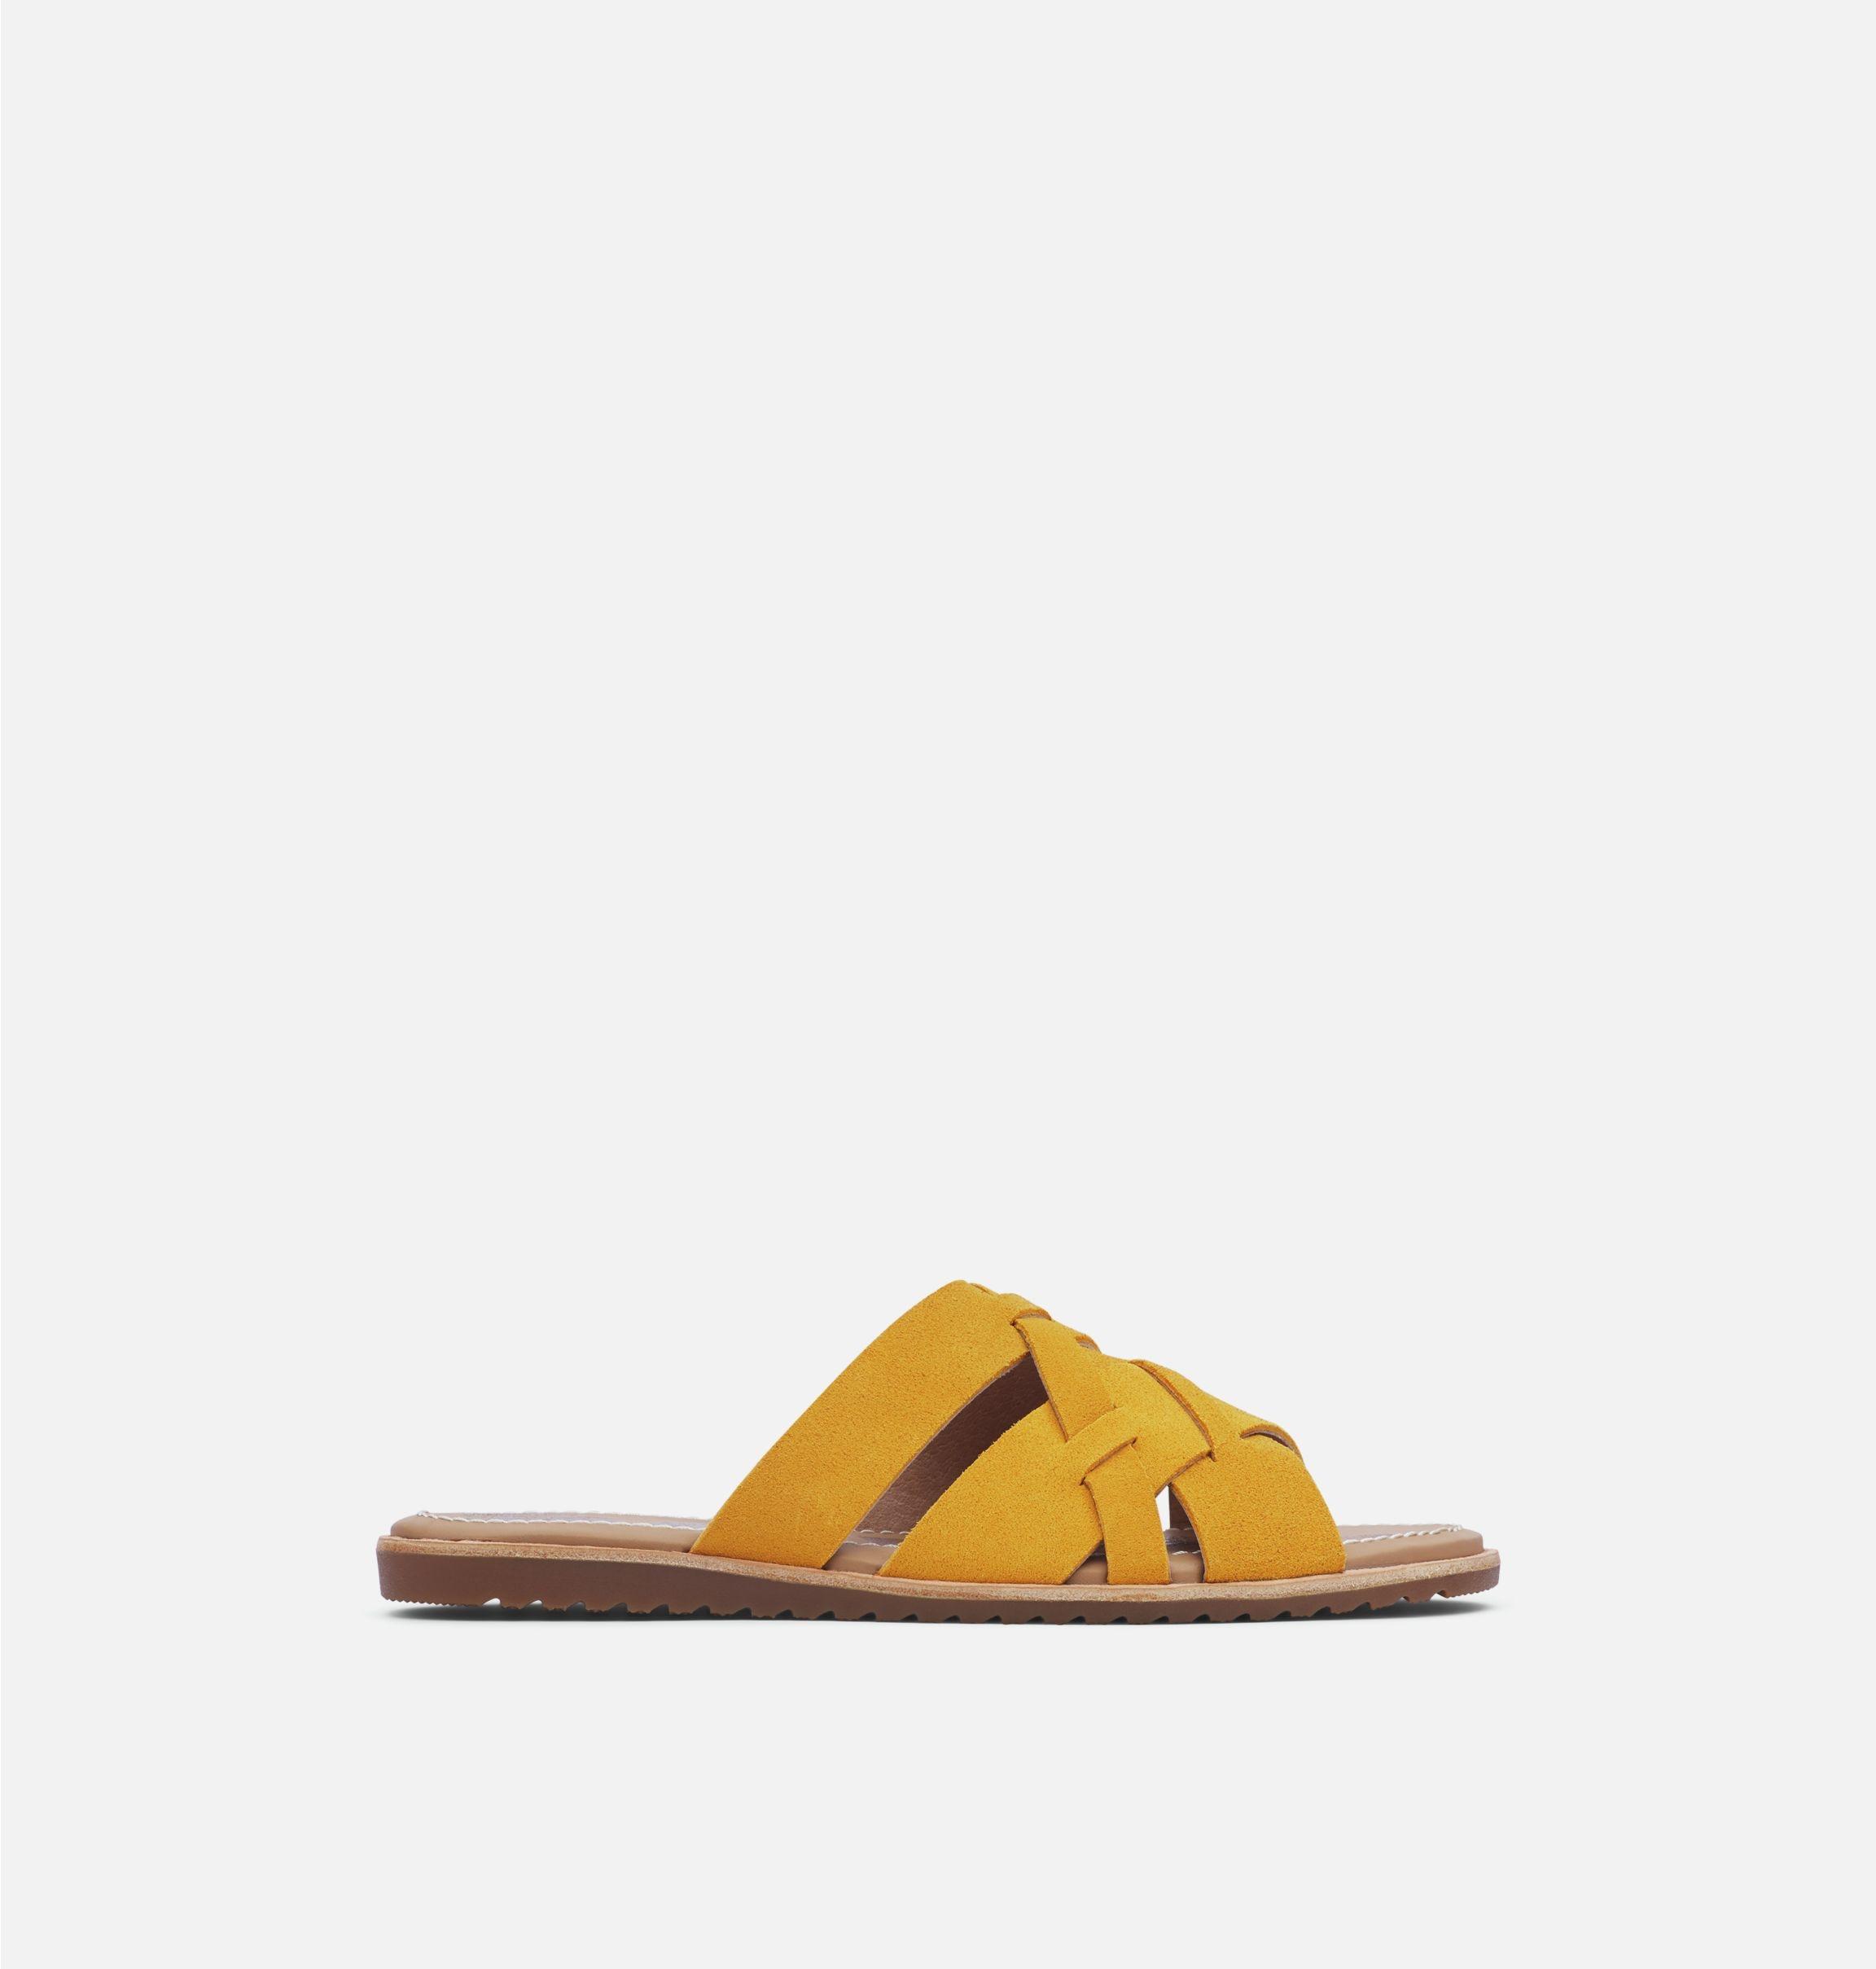 Sorel Women's Shoes: Ella Slide Sandal $32.15, Roaming Criss Cross Sandal $54.76, More + Free Shipping